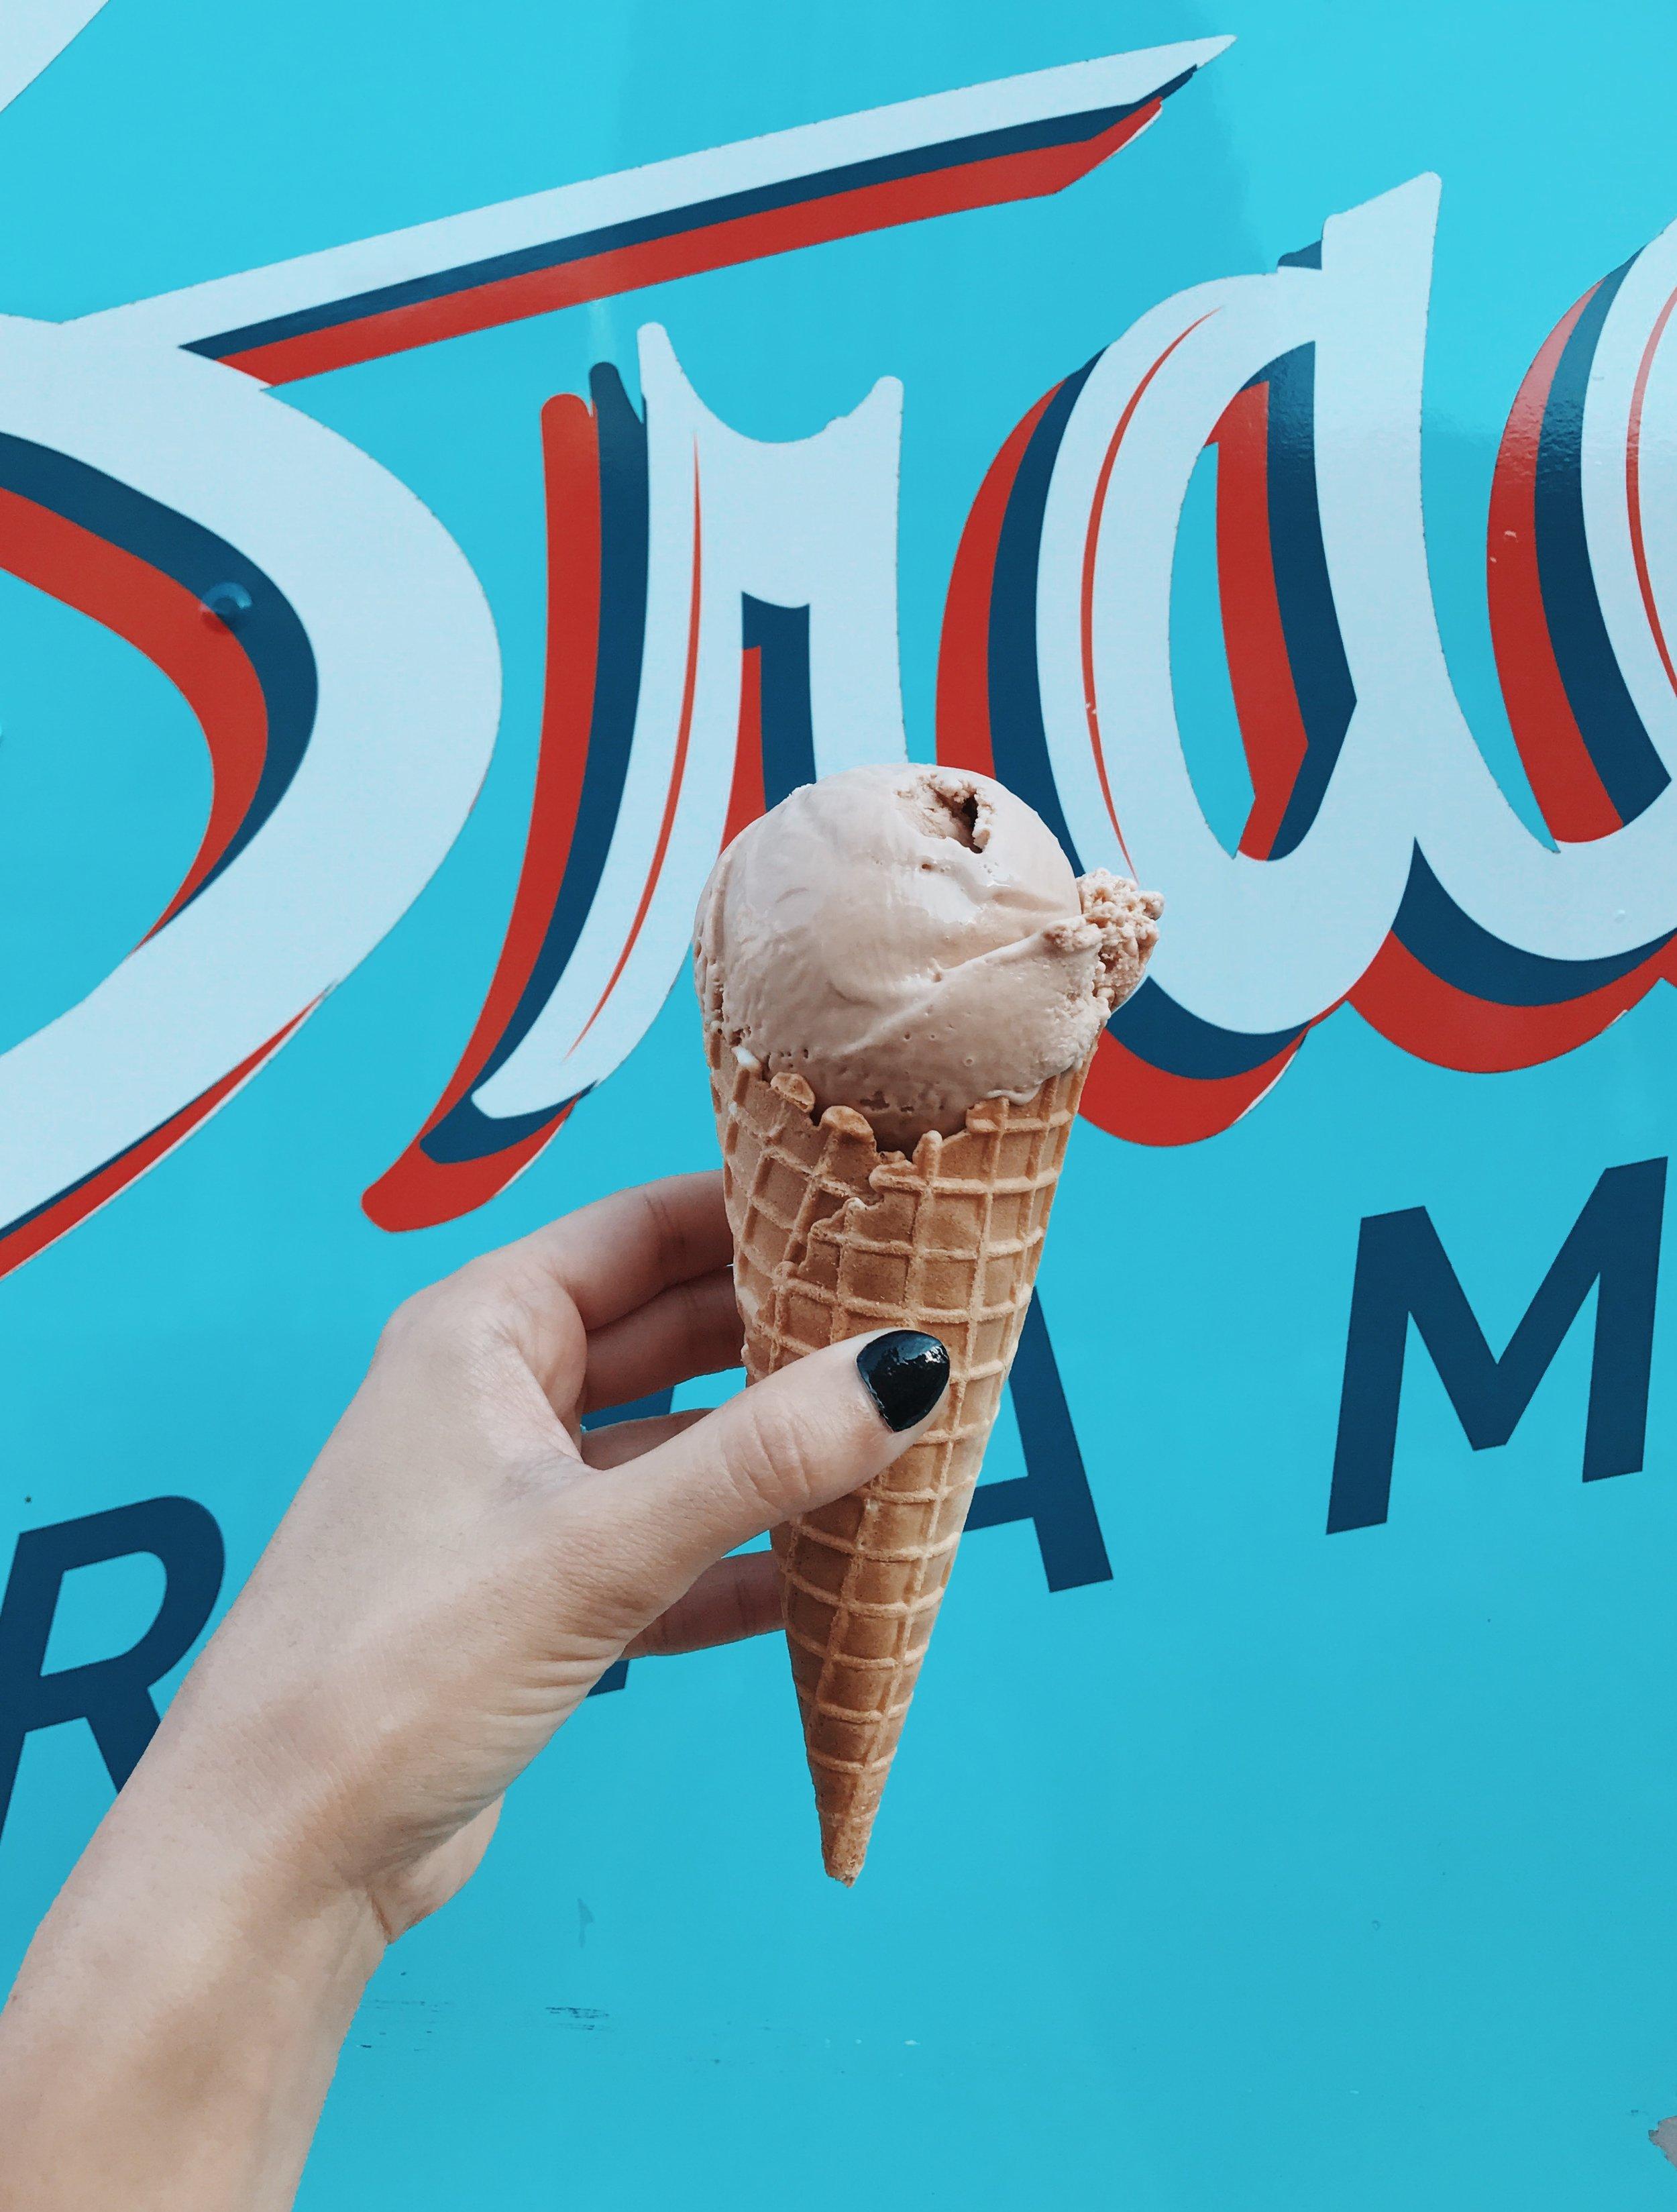 Bradley's Curbside Creamery Nashville